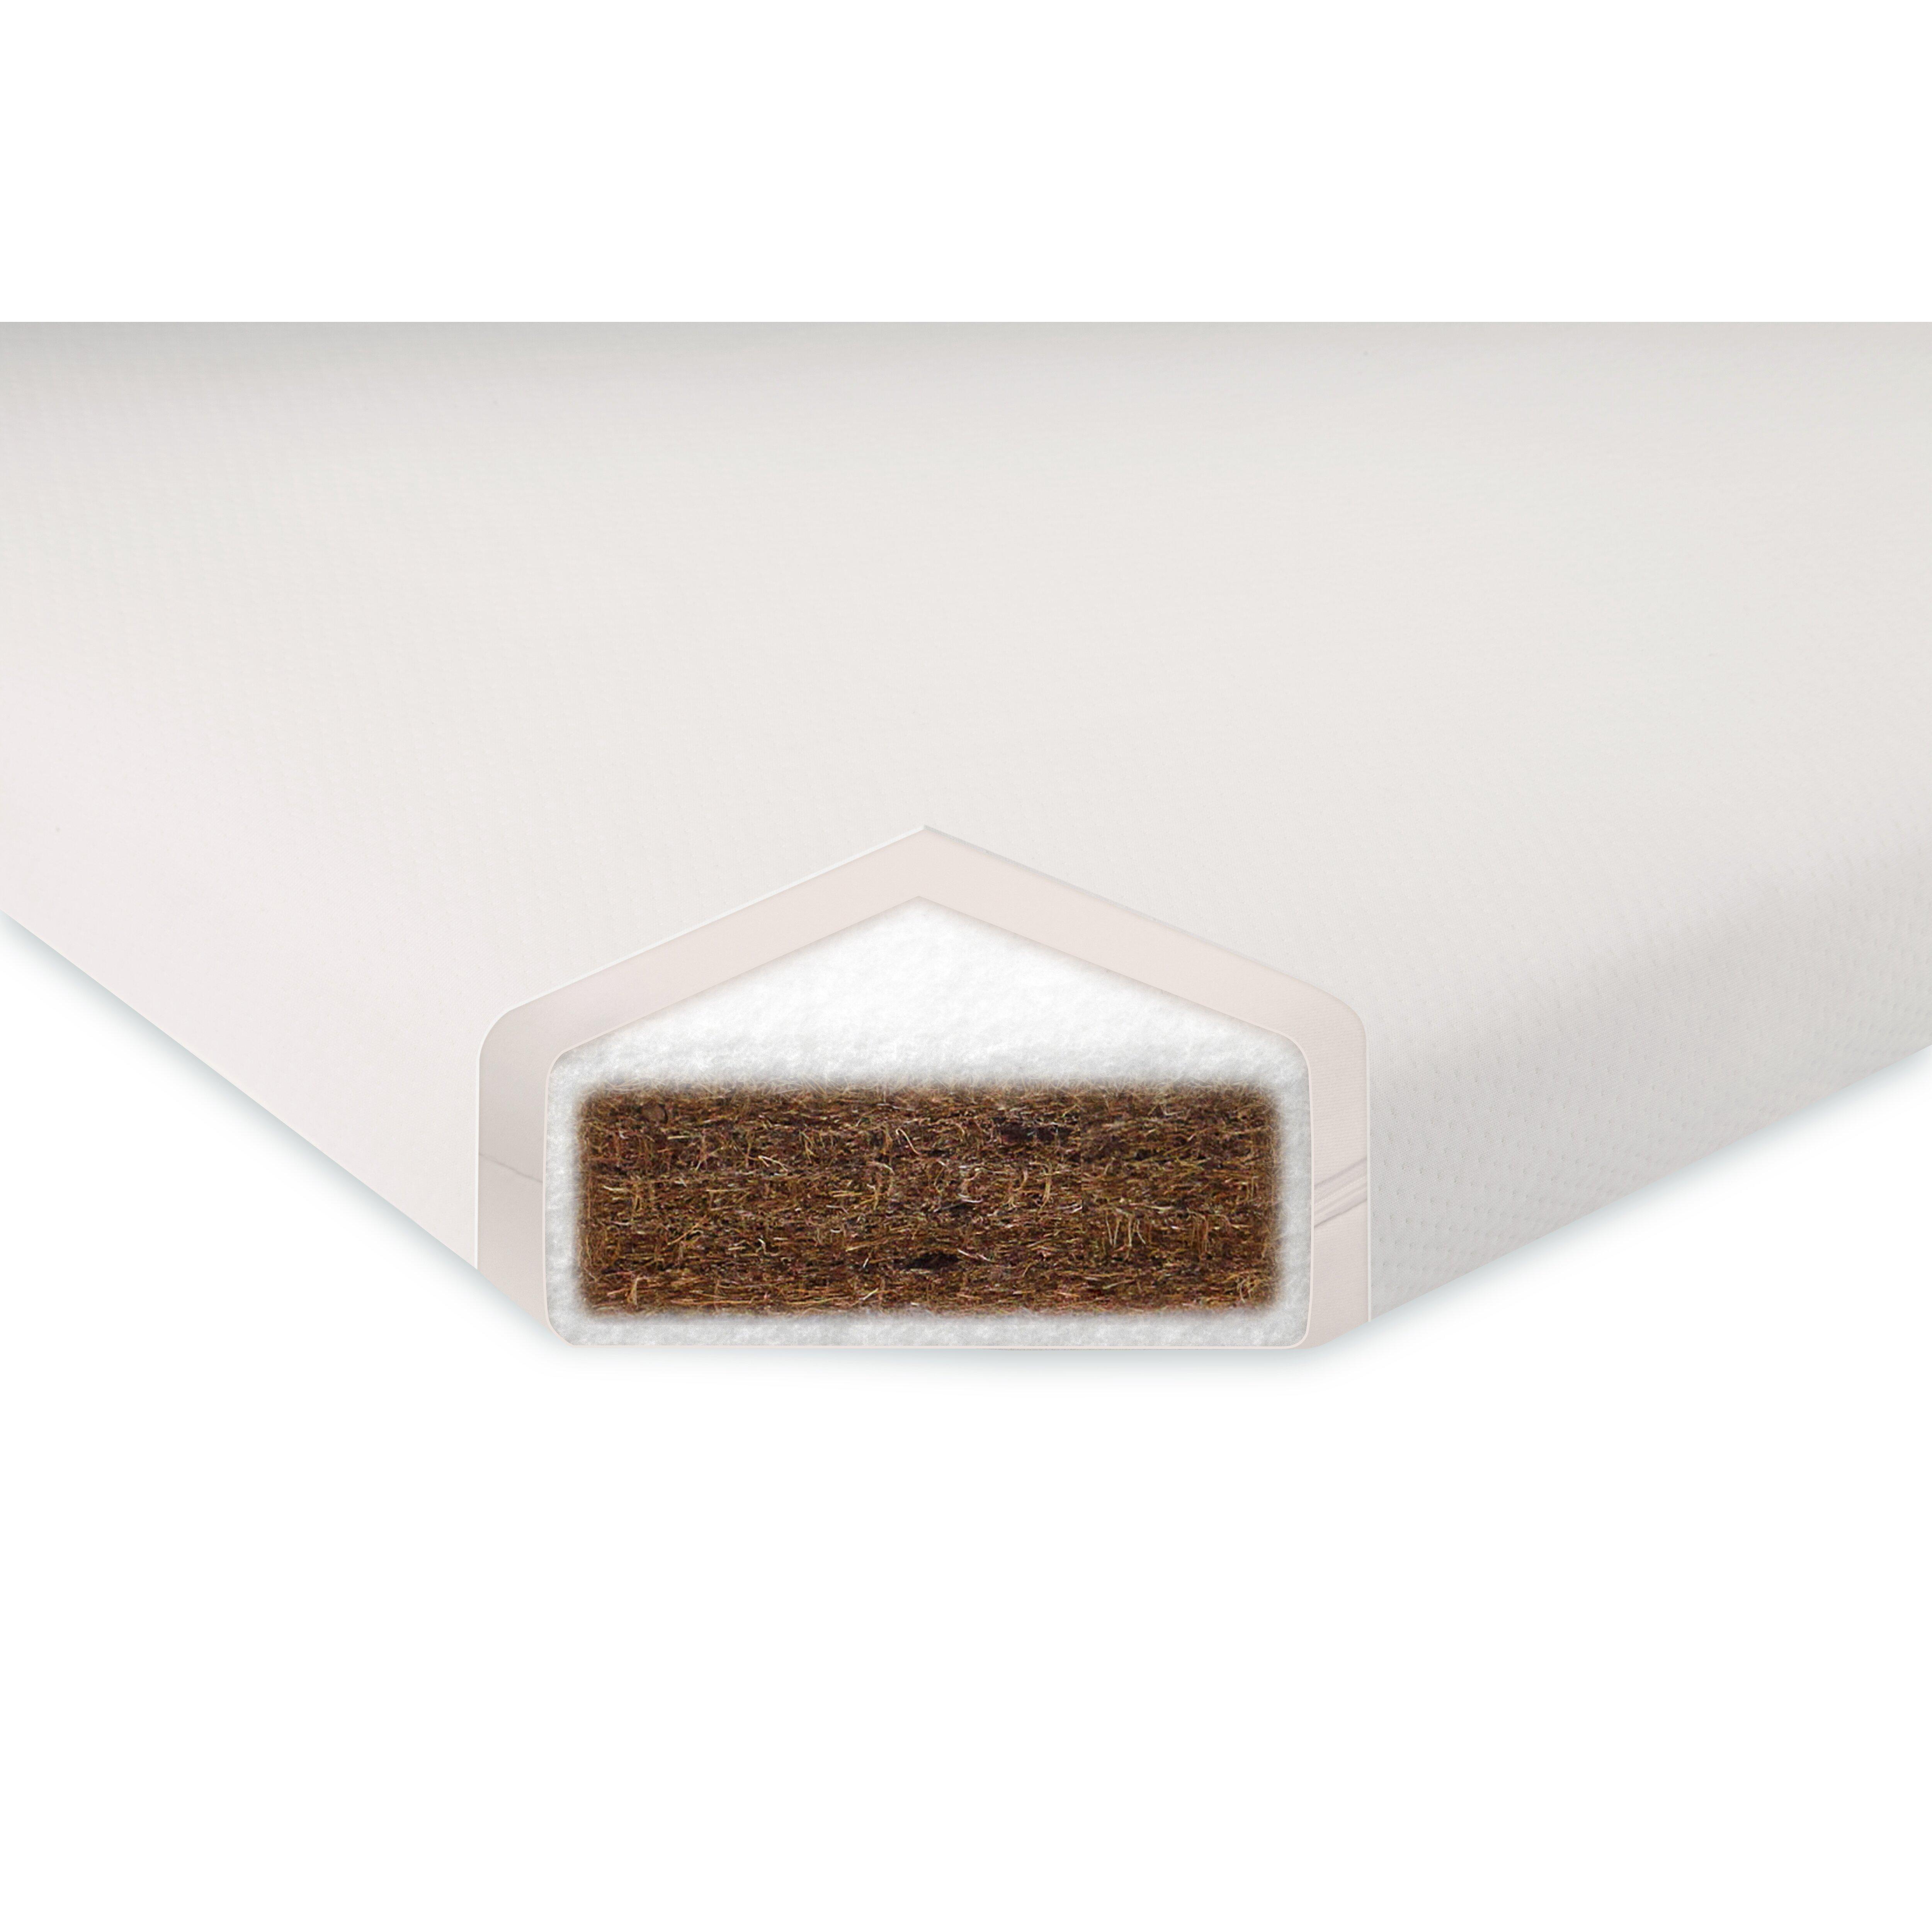 Non Toxic Bedroom Furniture Pure Core 5 Non Toxic Crib Mattress With Smart Cover Reviews